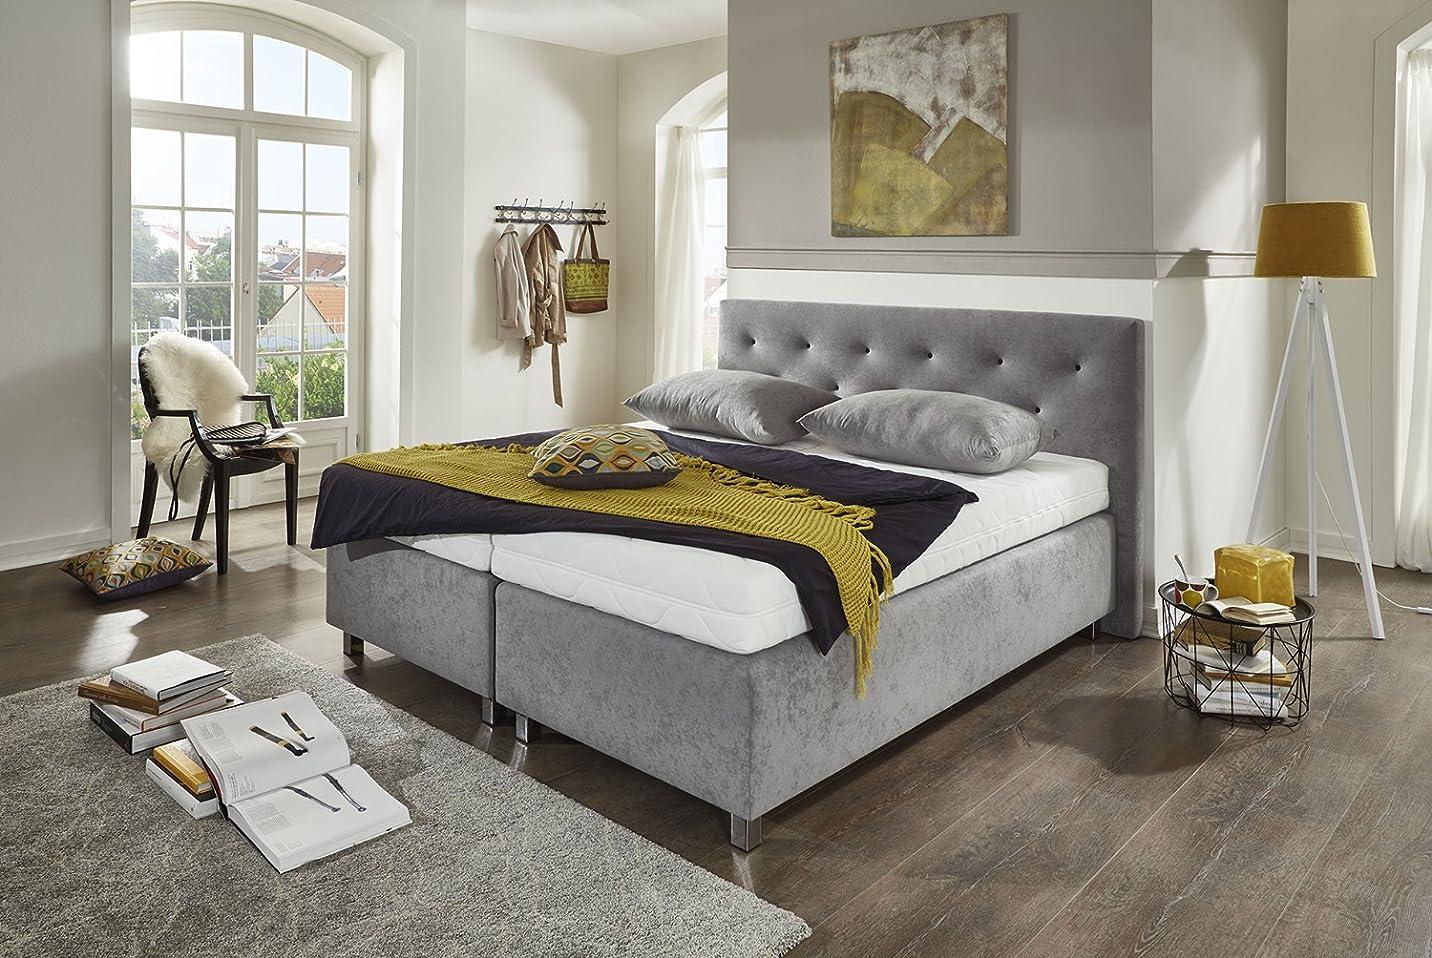 spenger bettenstudio boxspringbett rowina 120x200 cm unterfederung komfortschaum 7 zonen. Black Bedroom Furniture Sets. Home Design Ideas